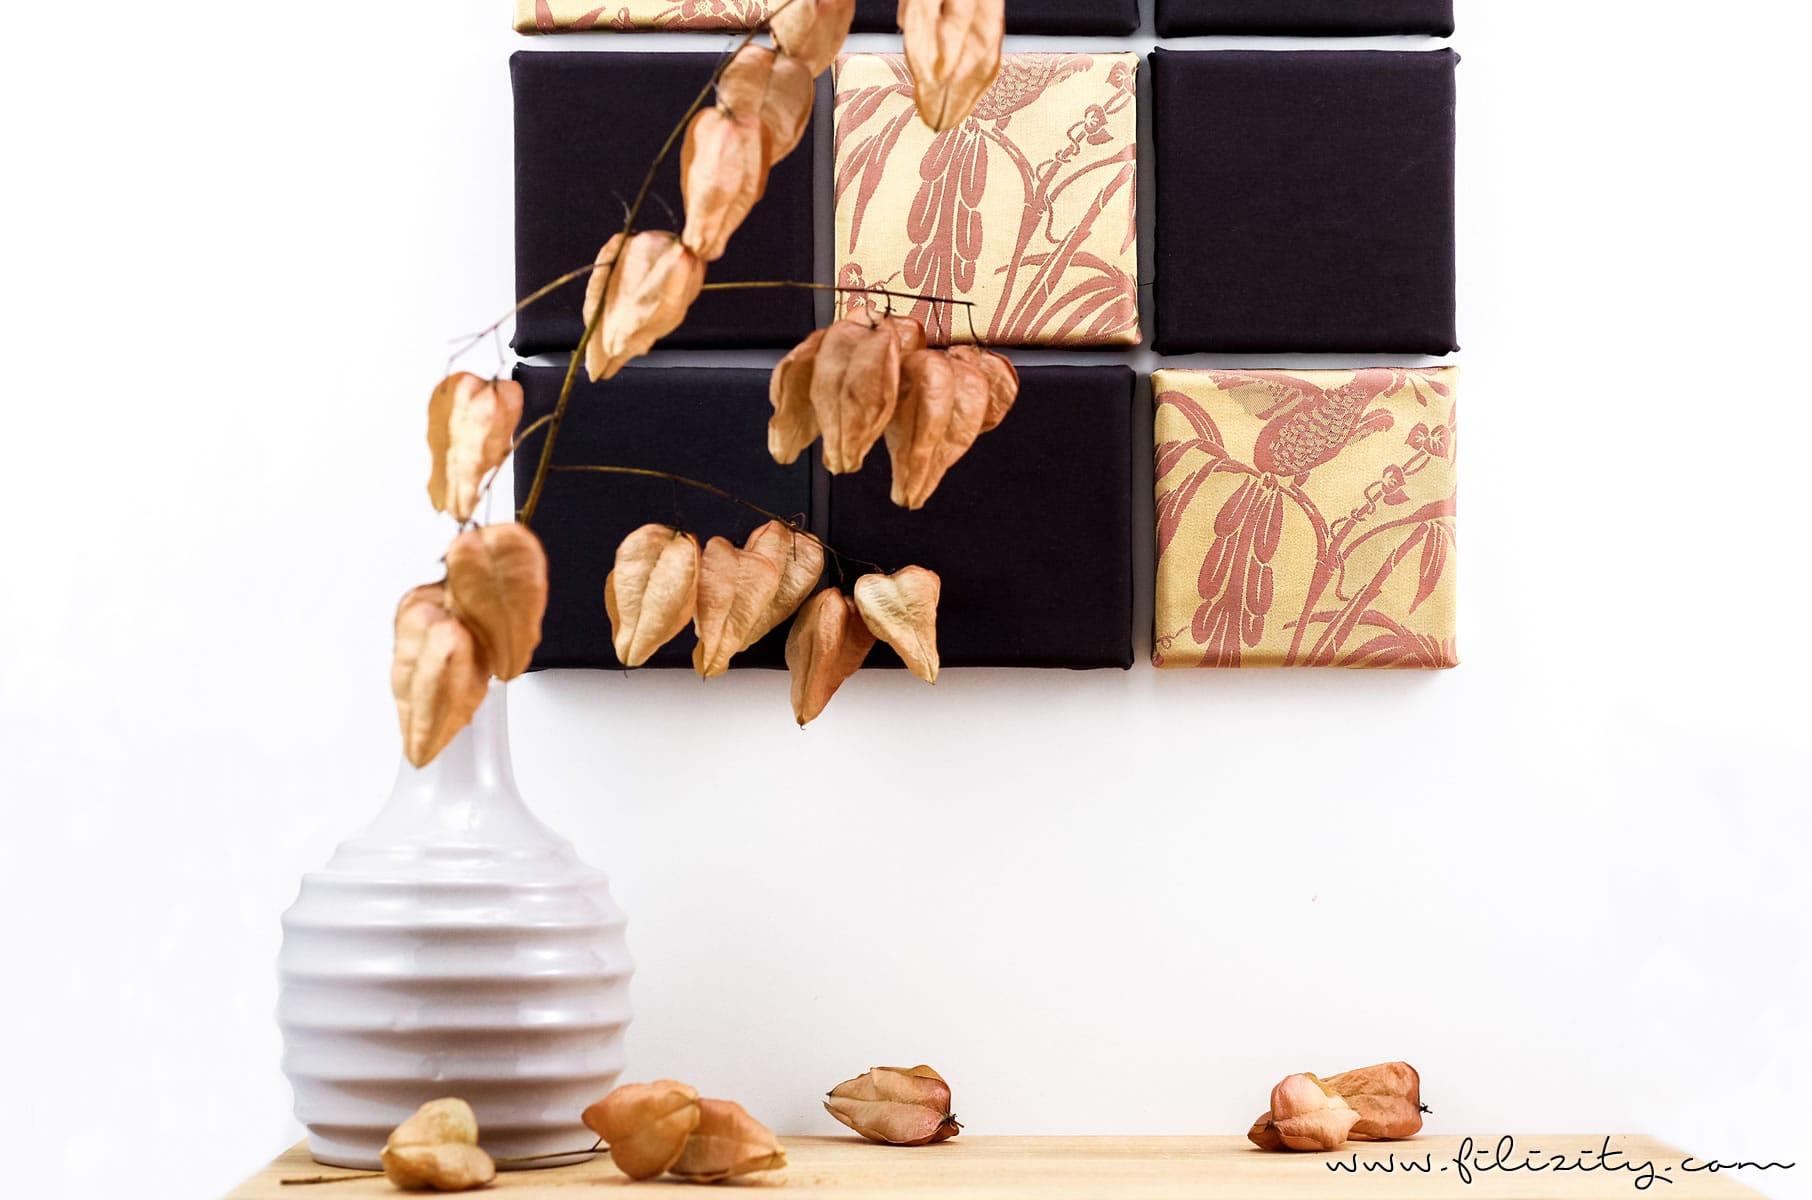 wanddeko aus altem m nnerhemd selber machen diy blog aus koblenz. Black Bedroom Furniture Sets. Home Design Ideas